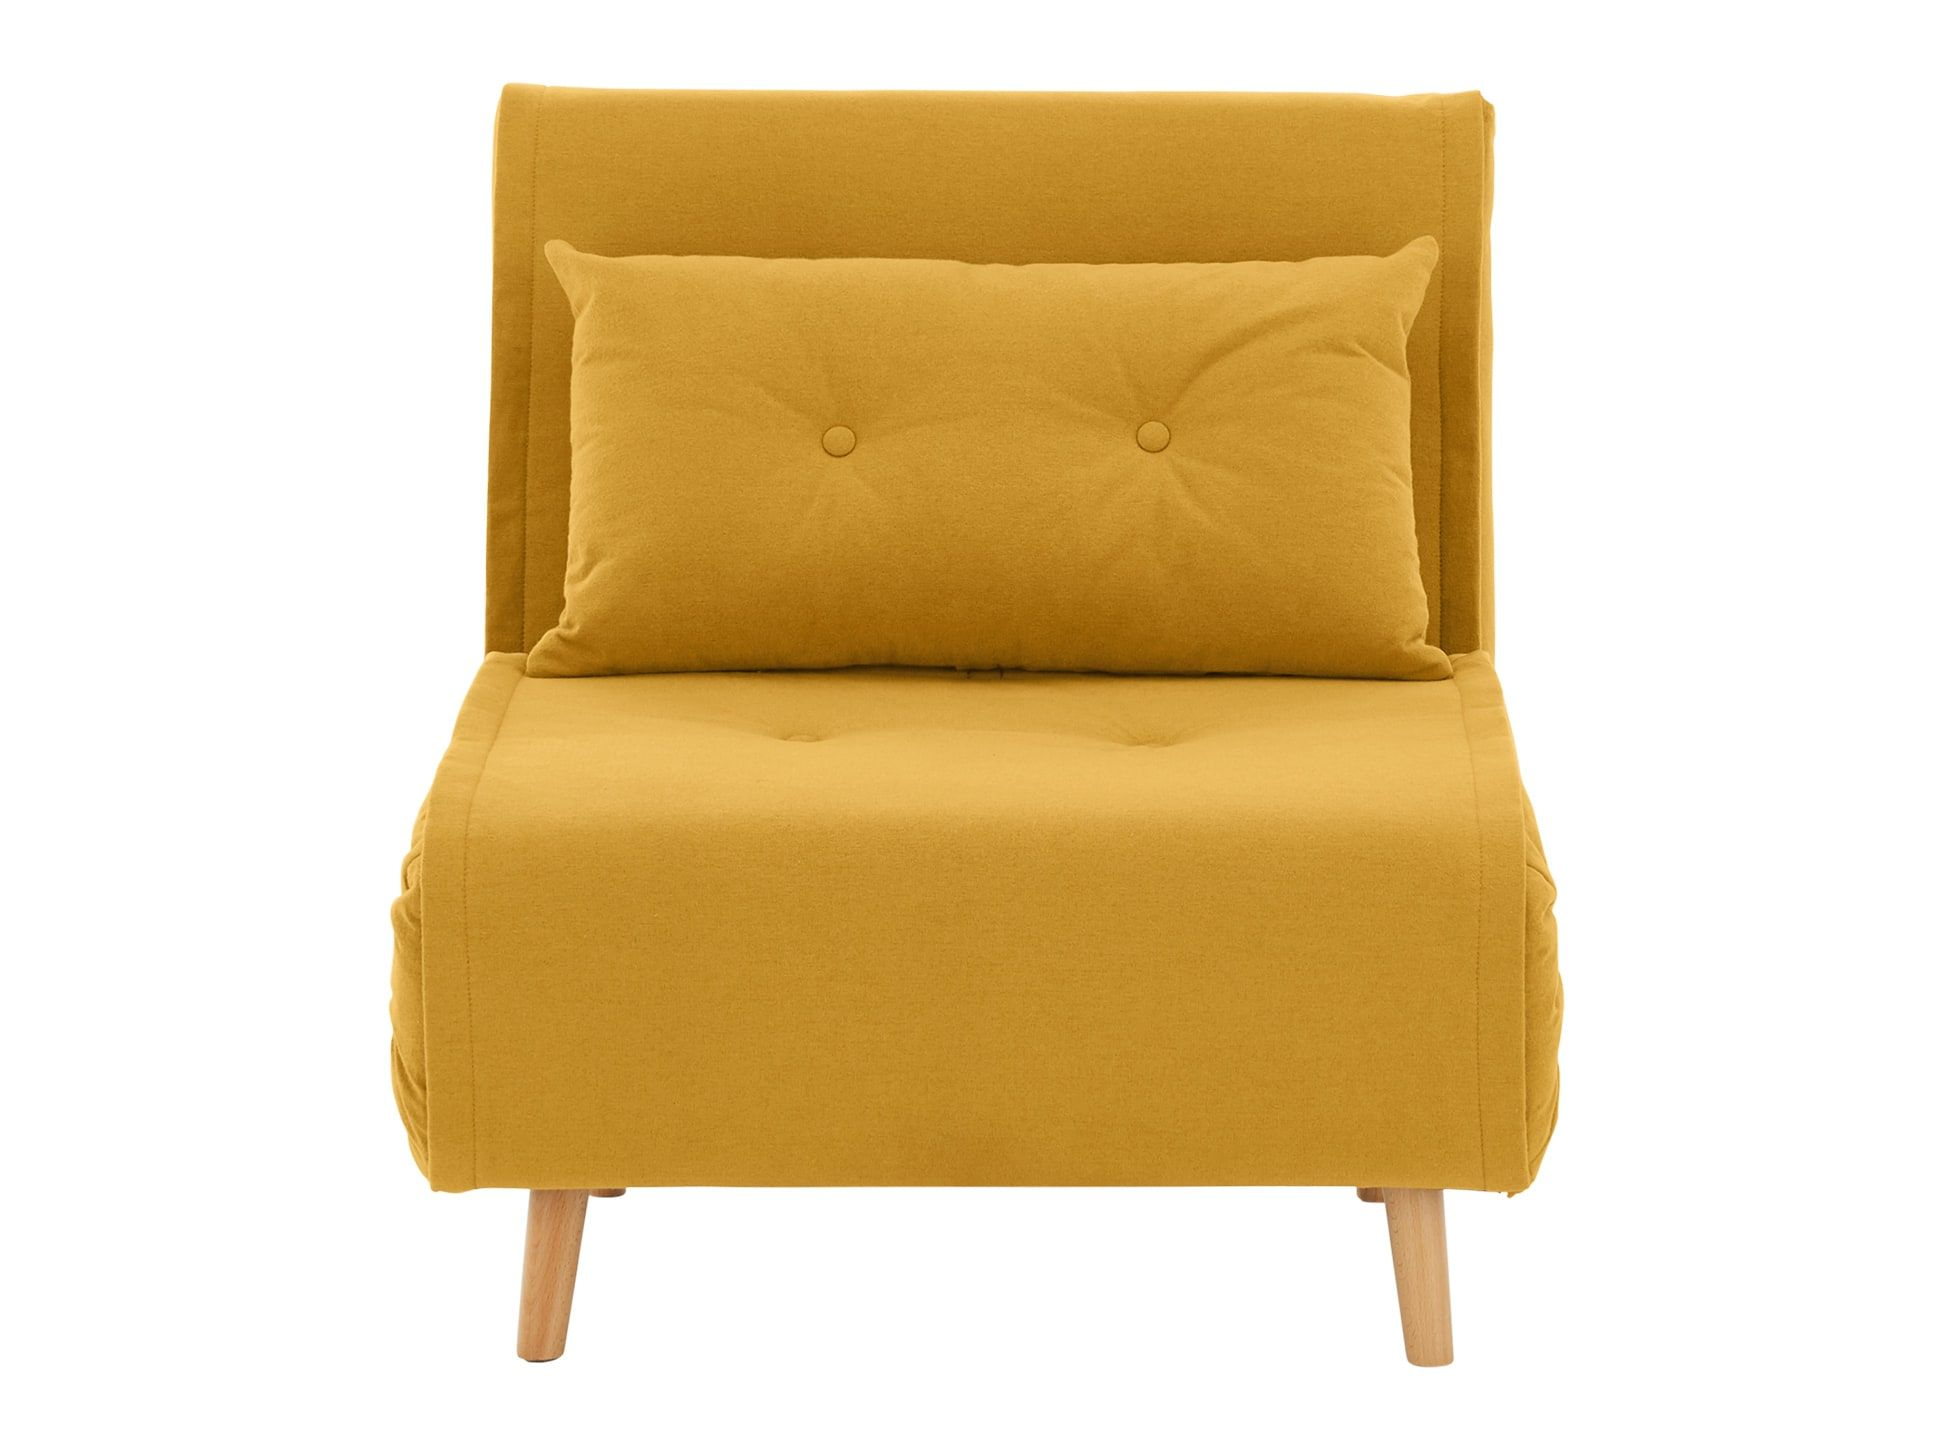 MADE butter yellow Sofa bed Sofa bed design, Single sofa